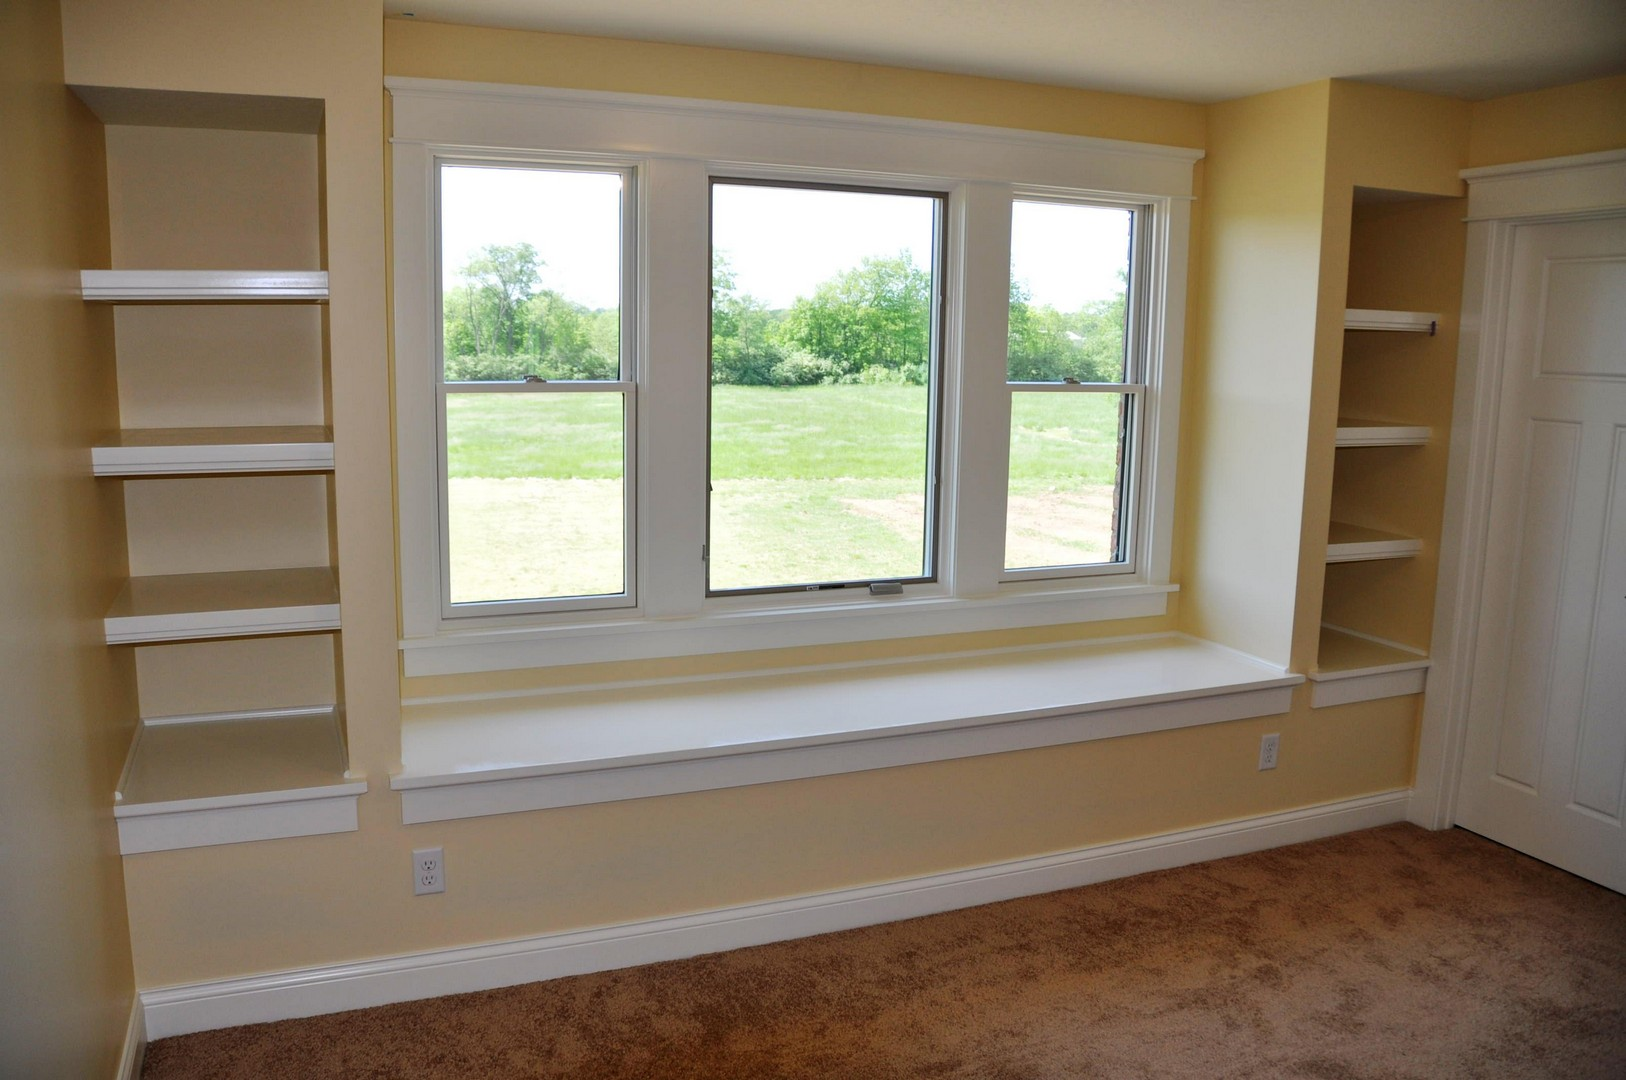 Daniel DeVol Builder - Bellbrook Residence